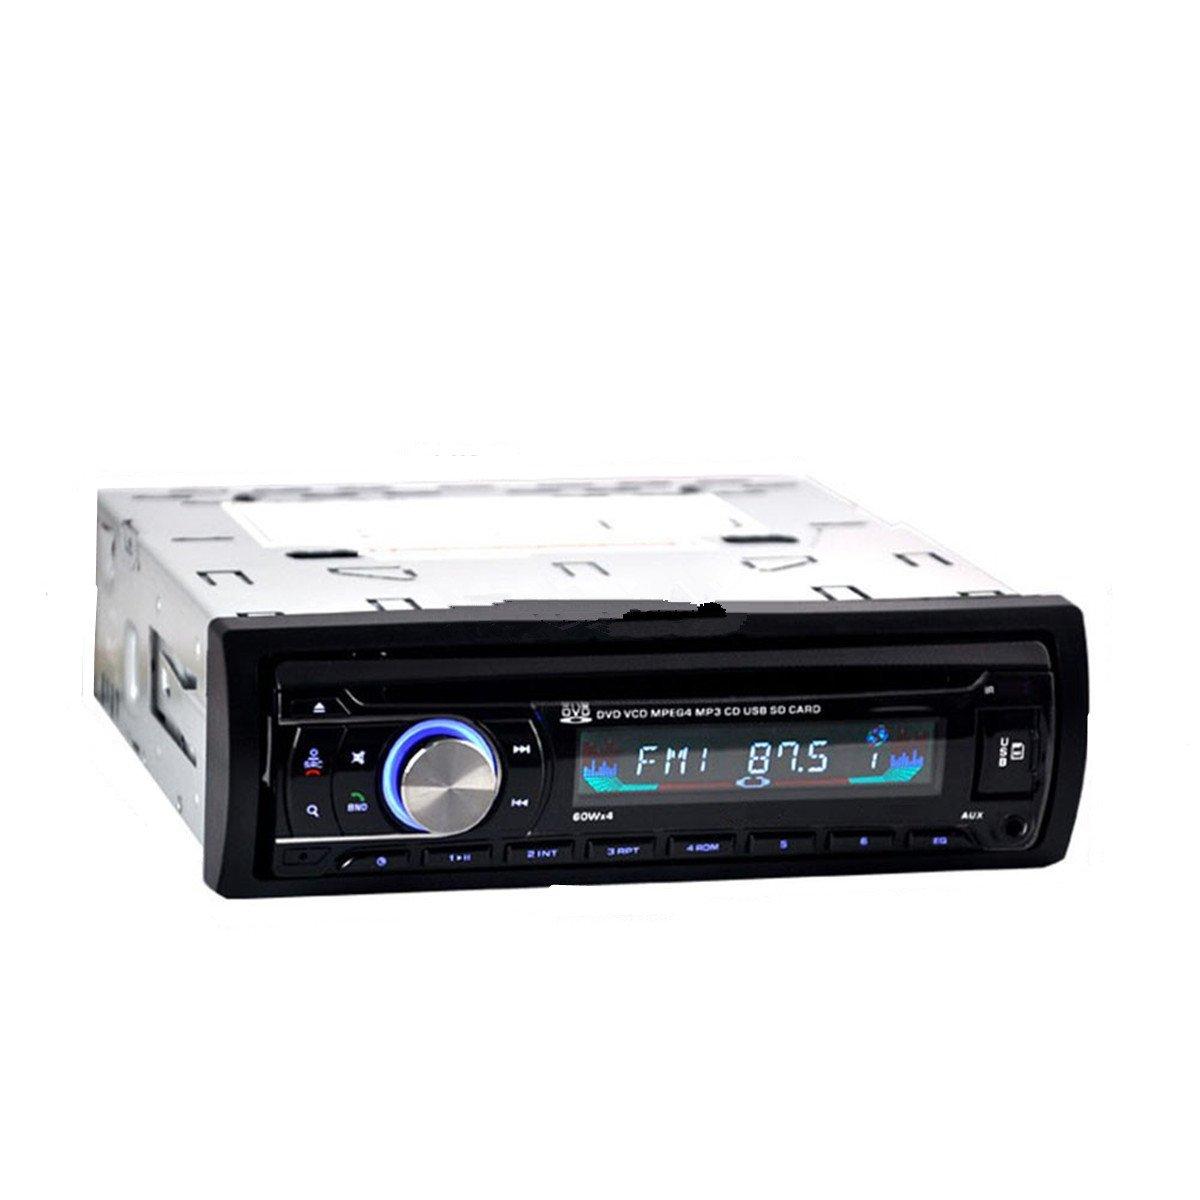 Fochutech IN DASH 1 DIN Car CD DVD SD MP3 Player Receiver Radio Bluetooth Stereo Head Unit Remote Control